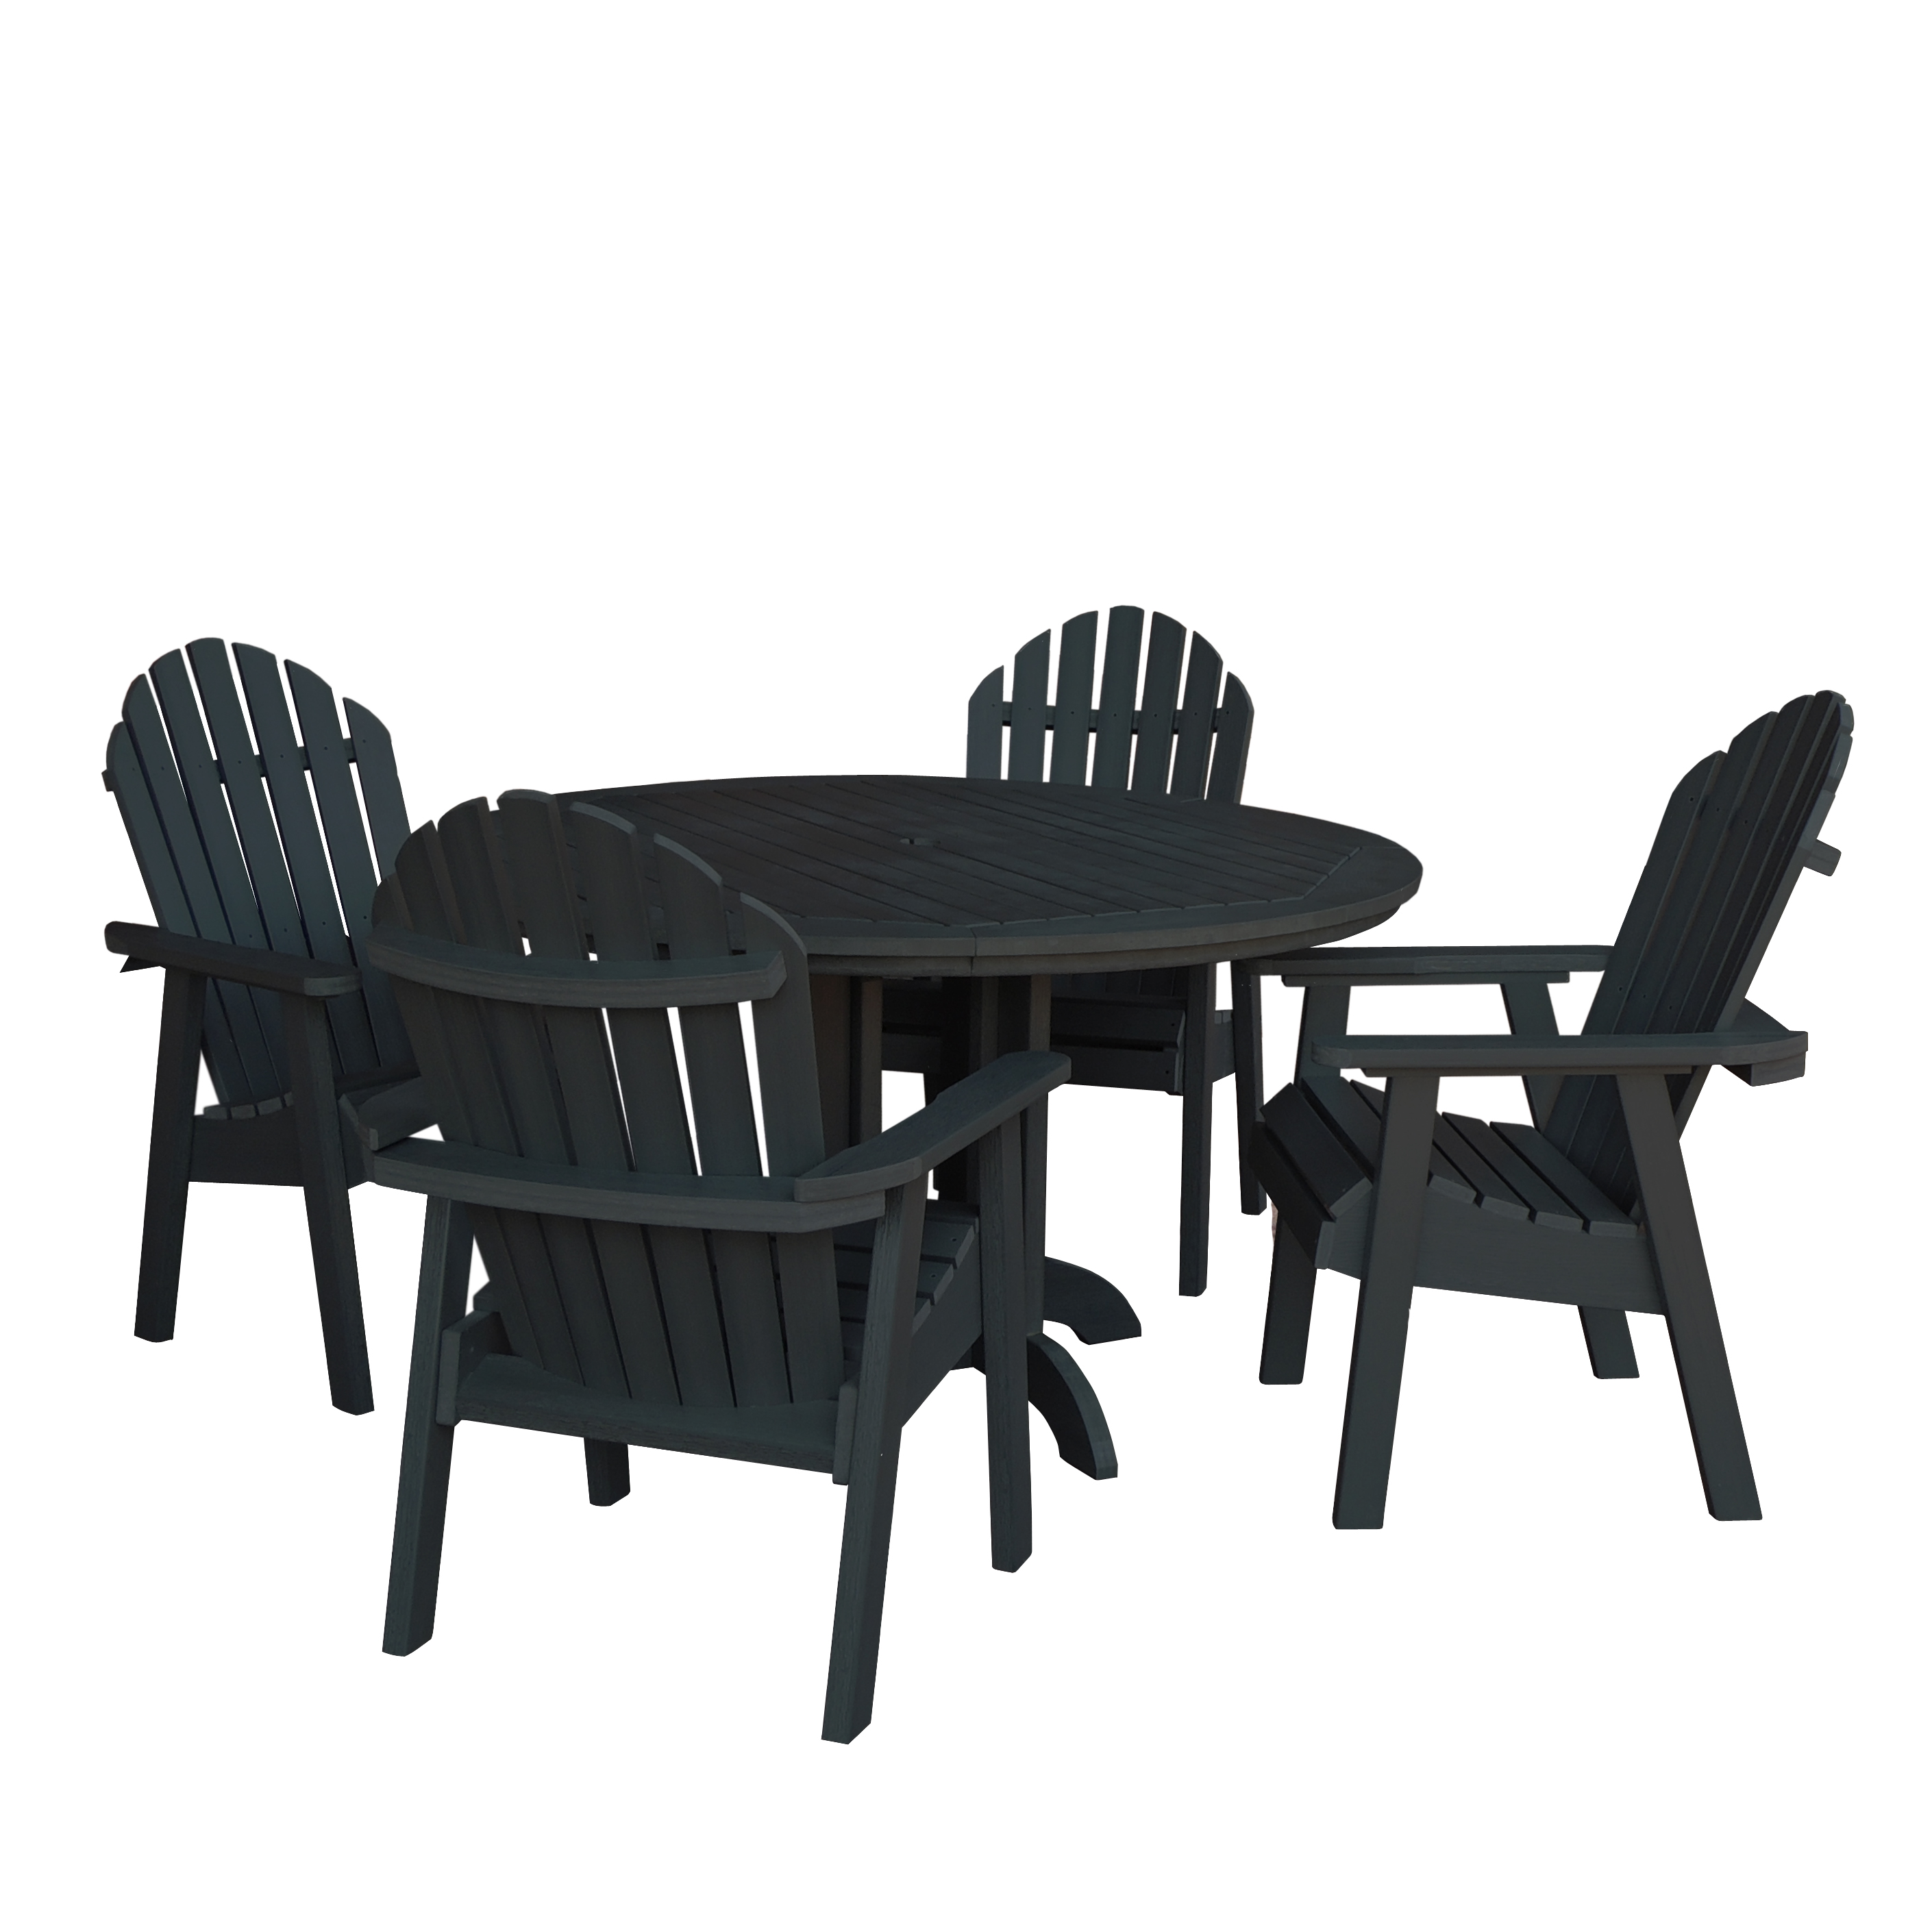 highwood® Eco-Friendly Recycled Plastic Hamilton 5pc Round Dining Set